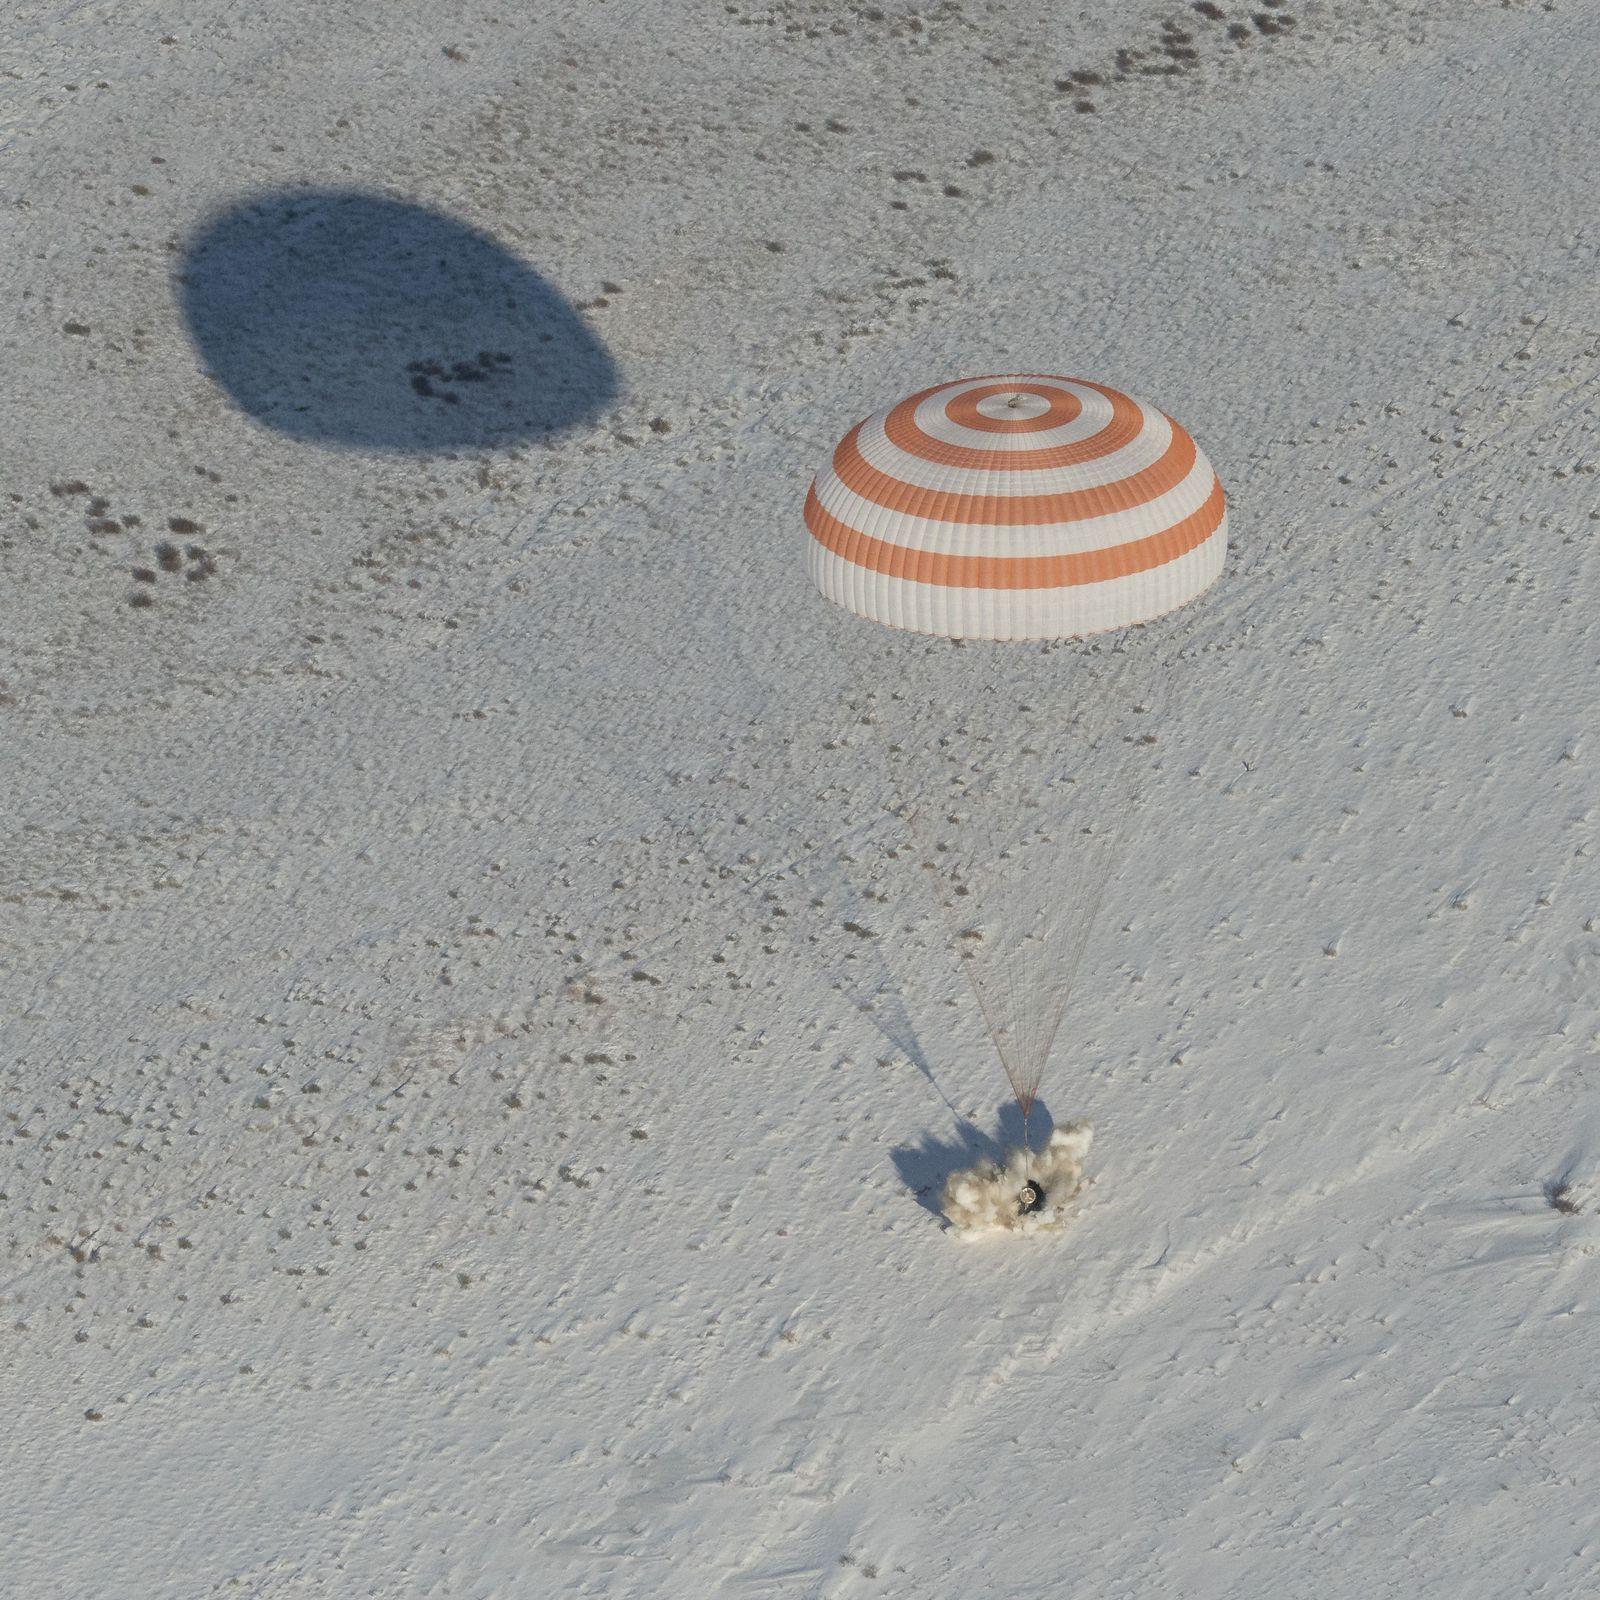 Landund ISS